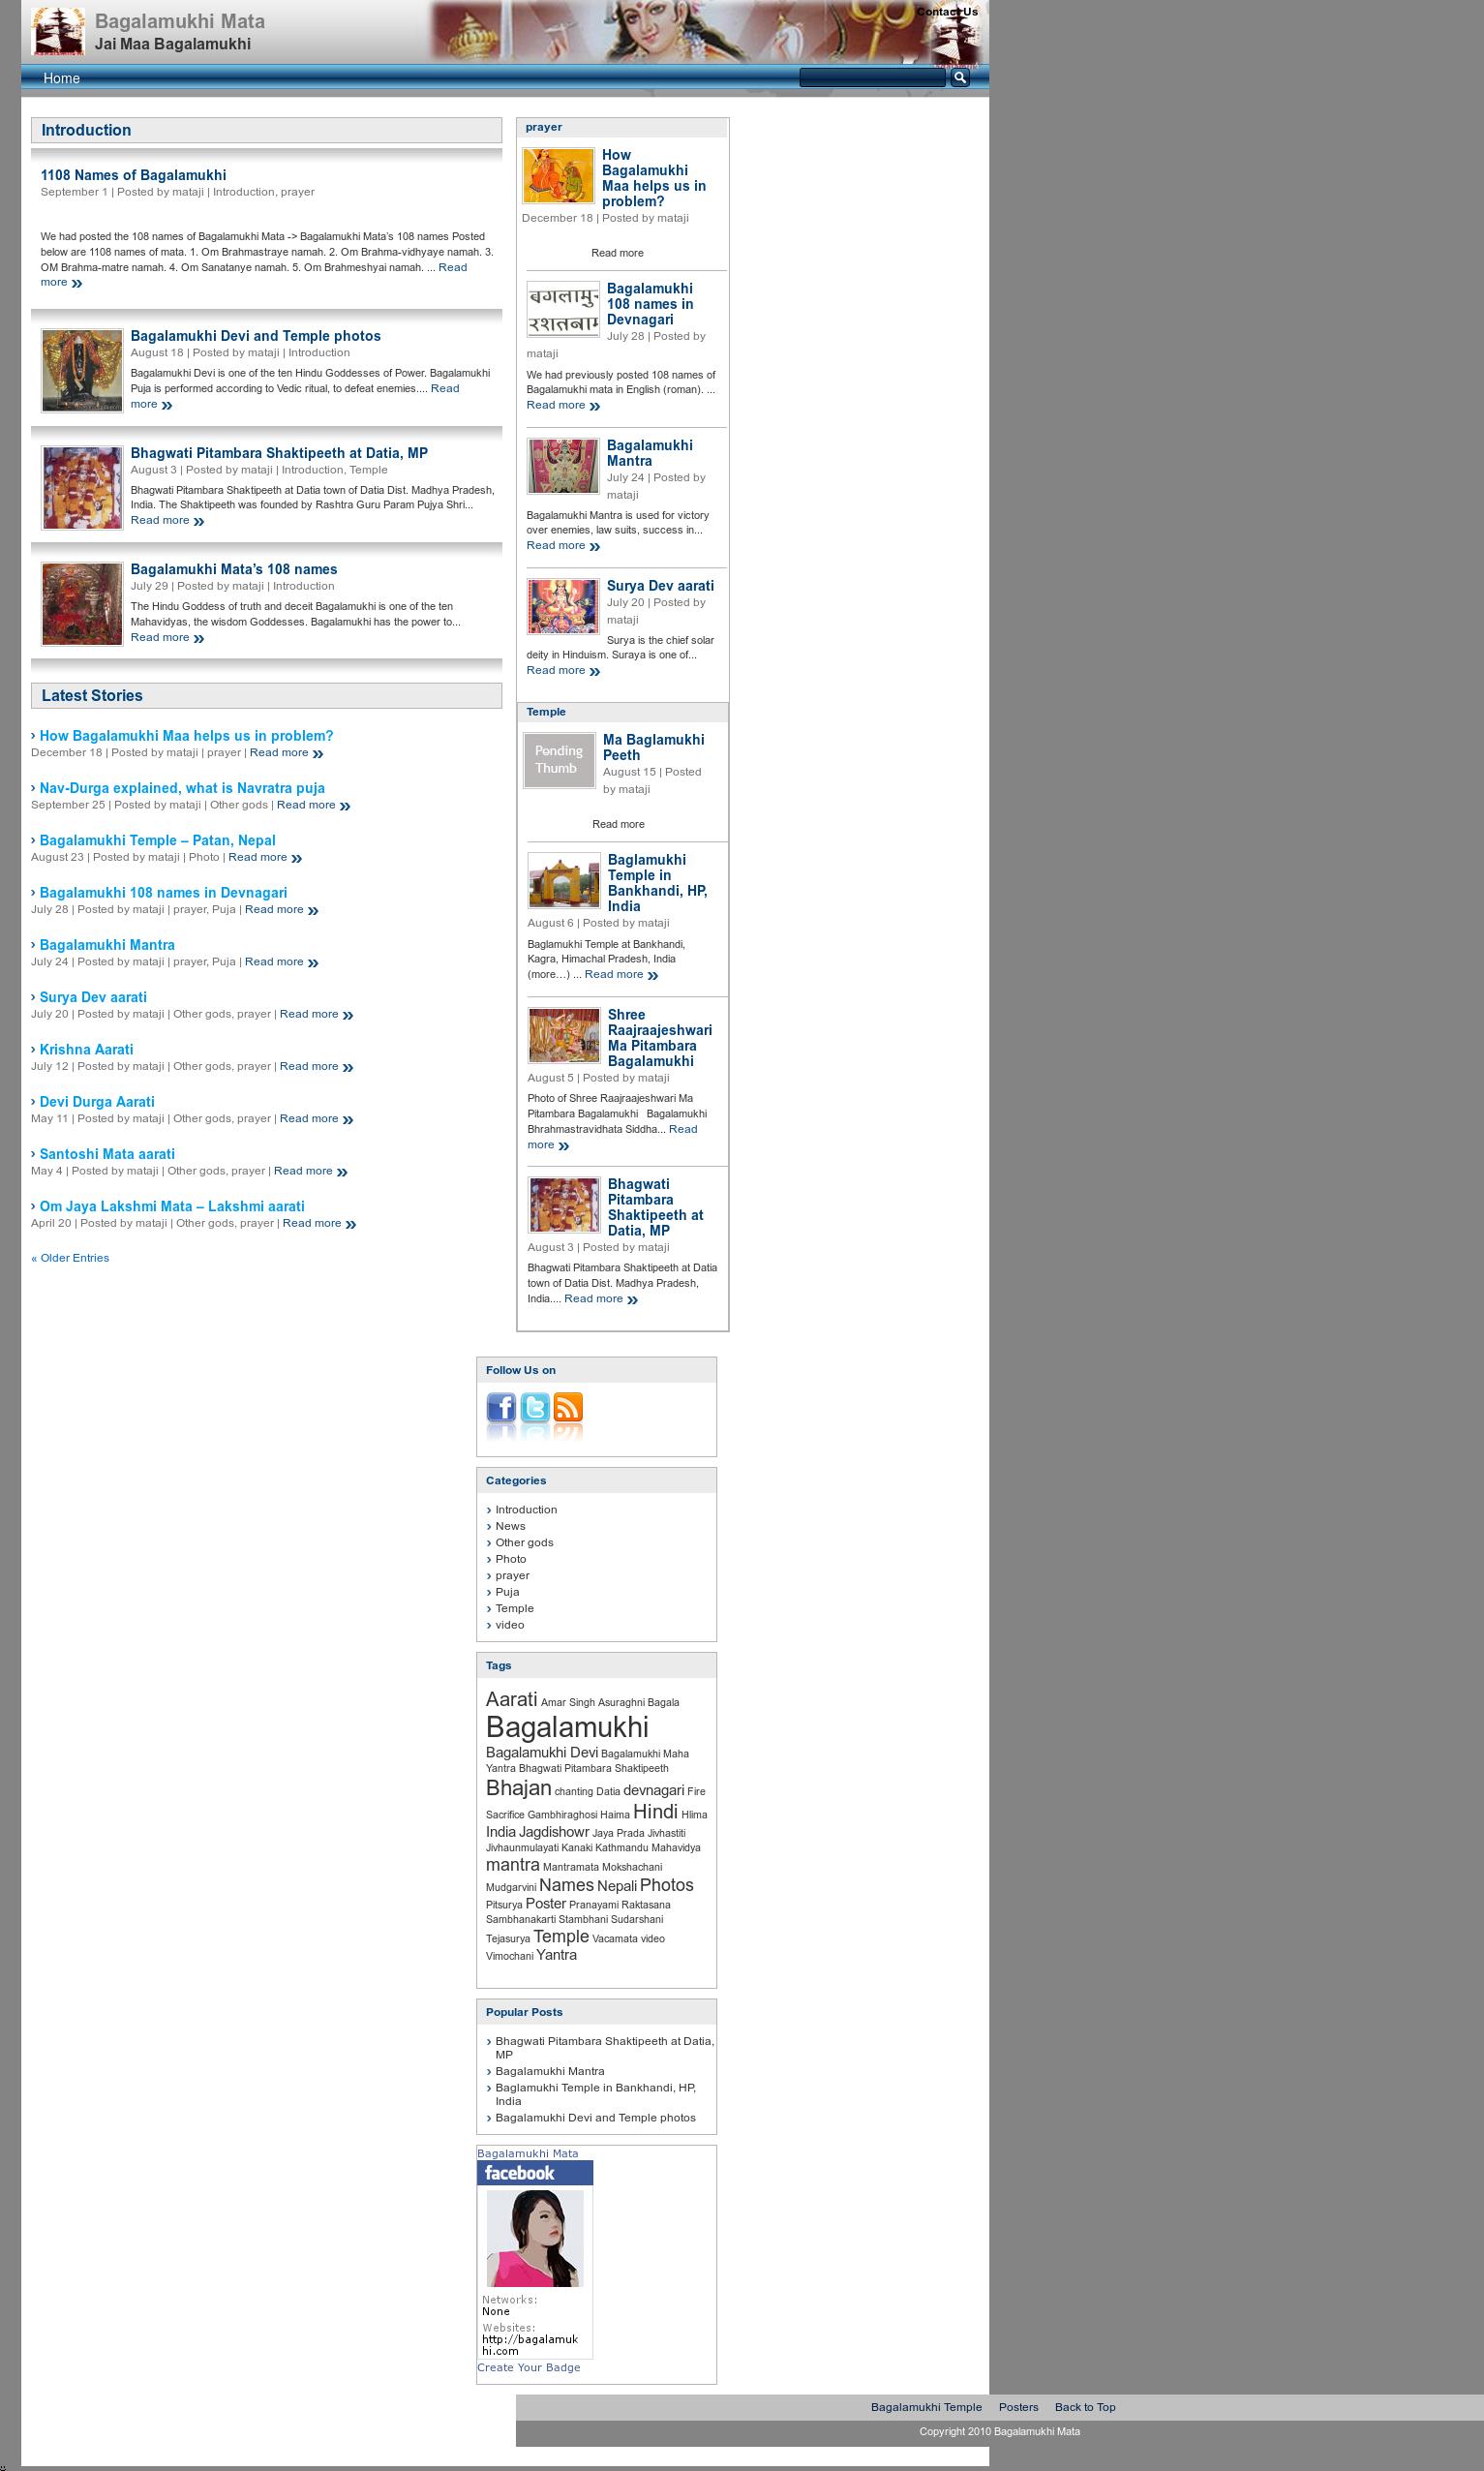 Bagalamukhi Maata Competitors, Revenue and Employees - Owler Company